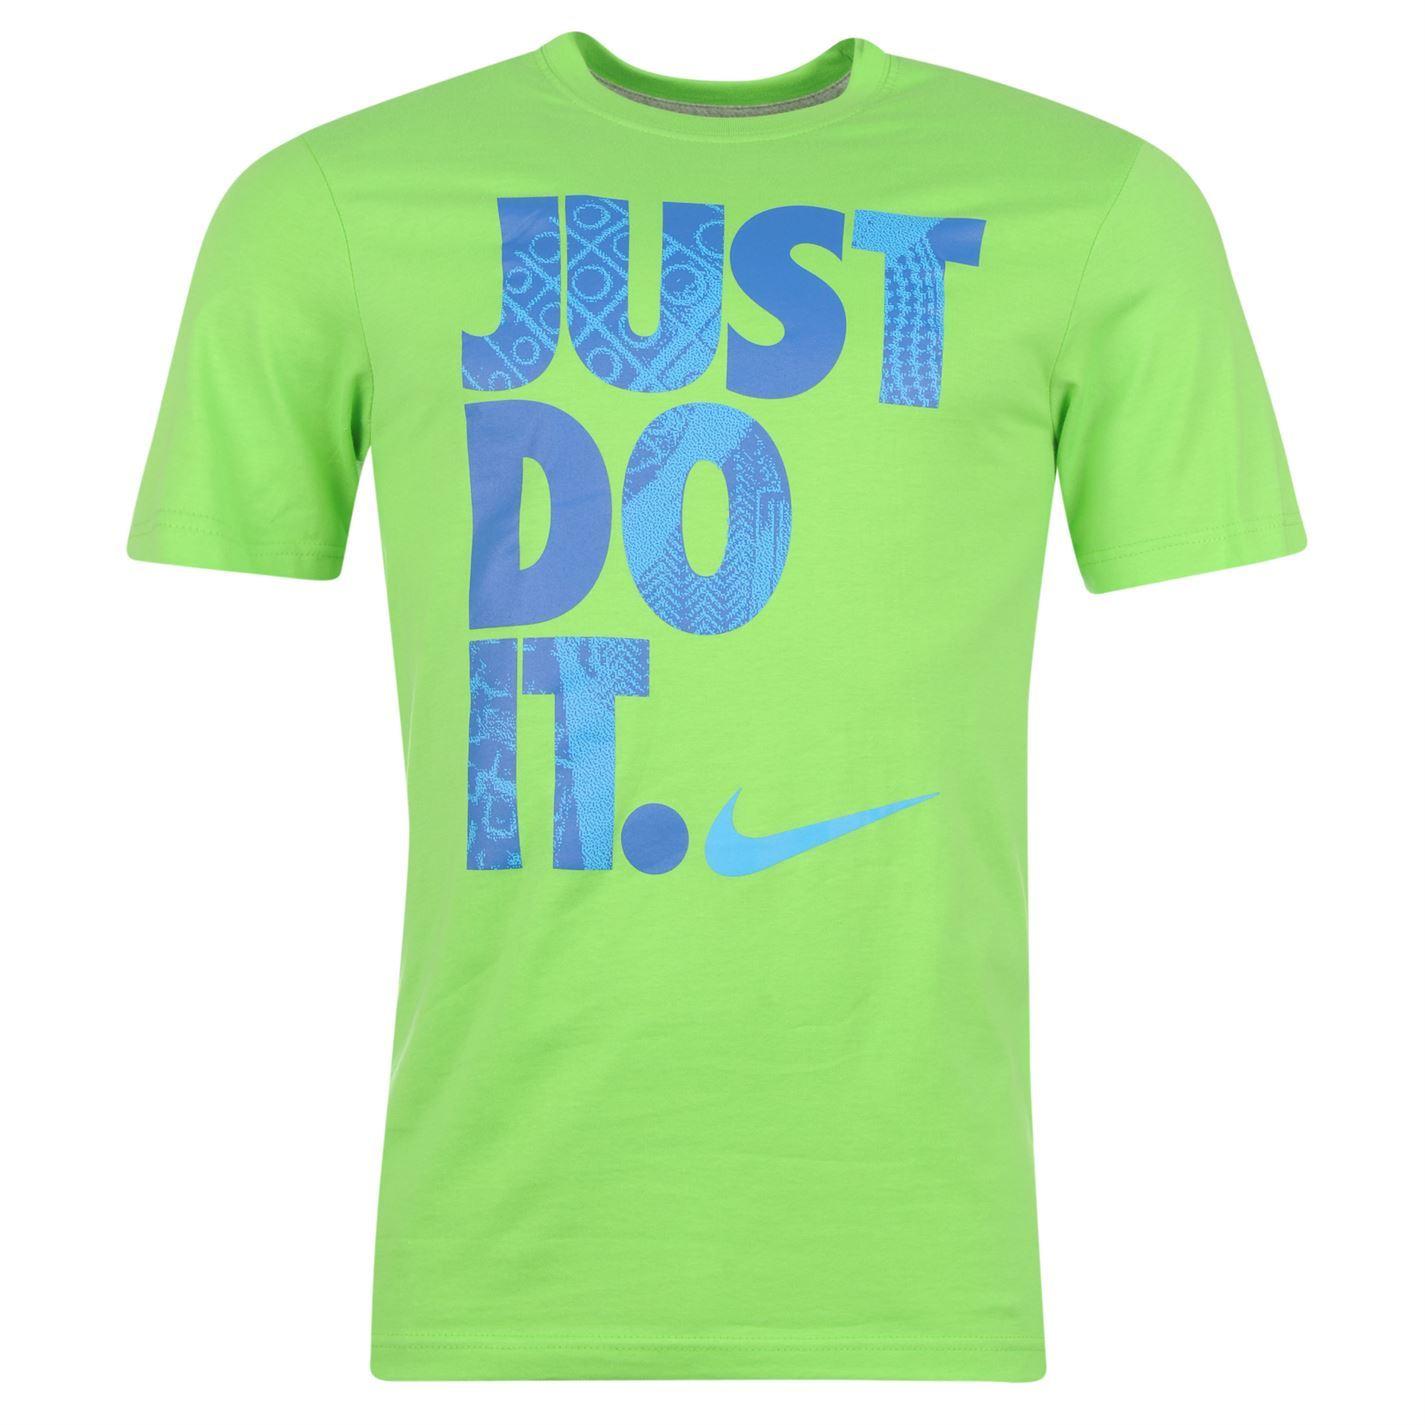 Nike Just Do It Mens T Shirt Green Top Tee Tshirt Ebay